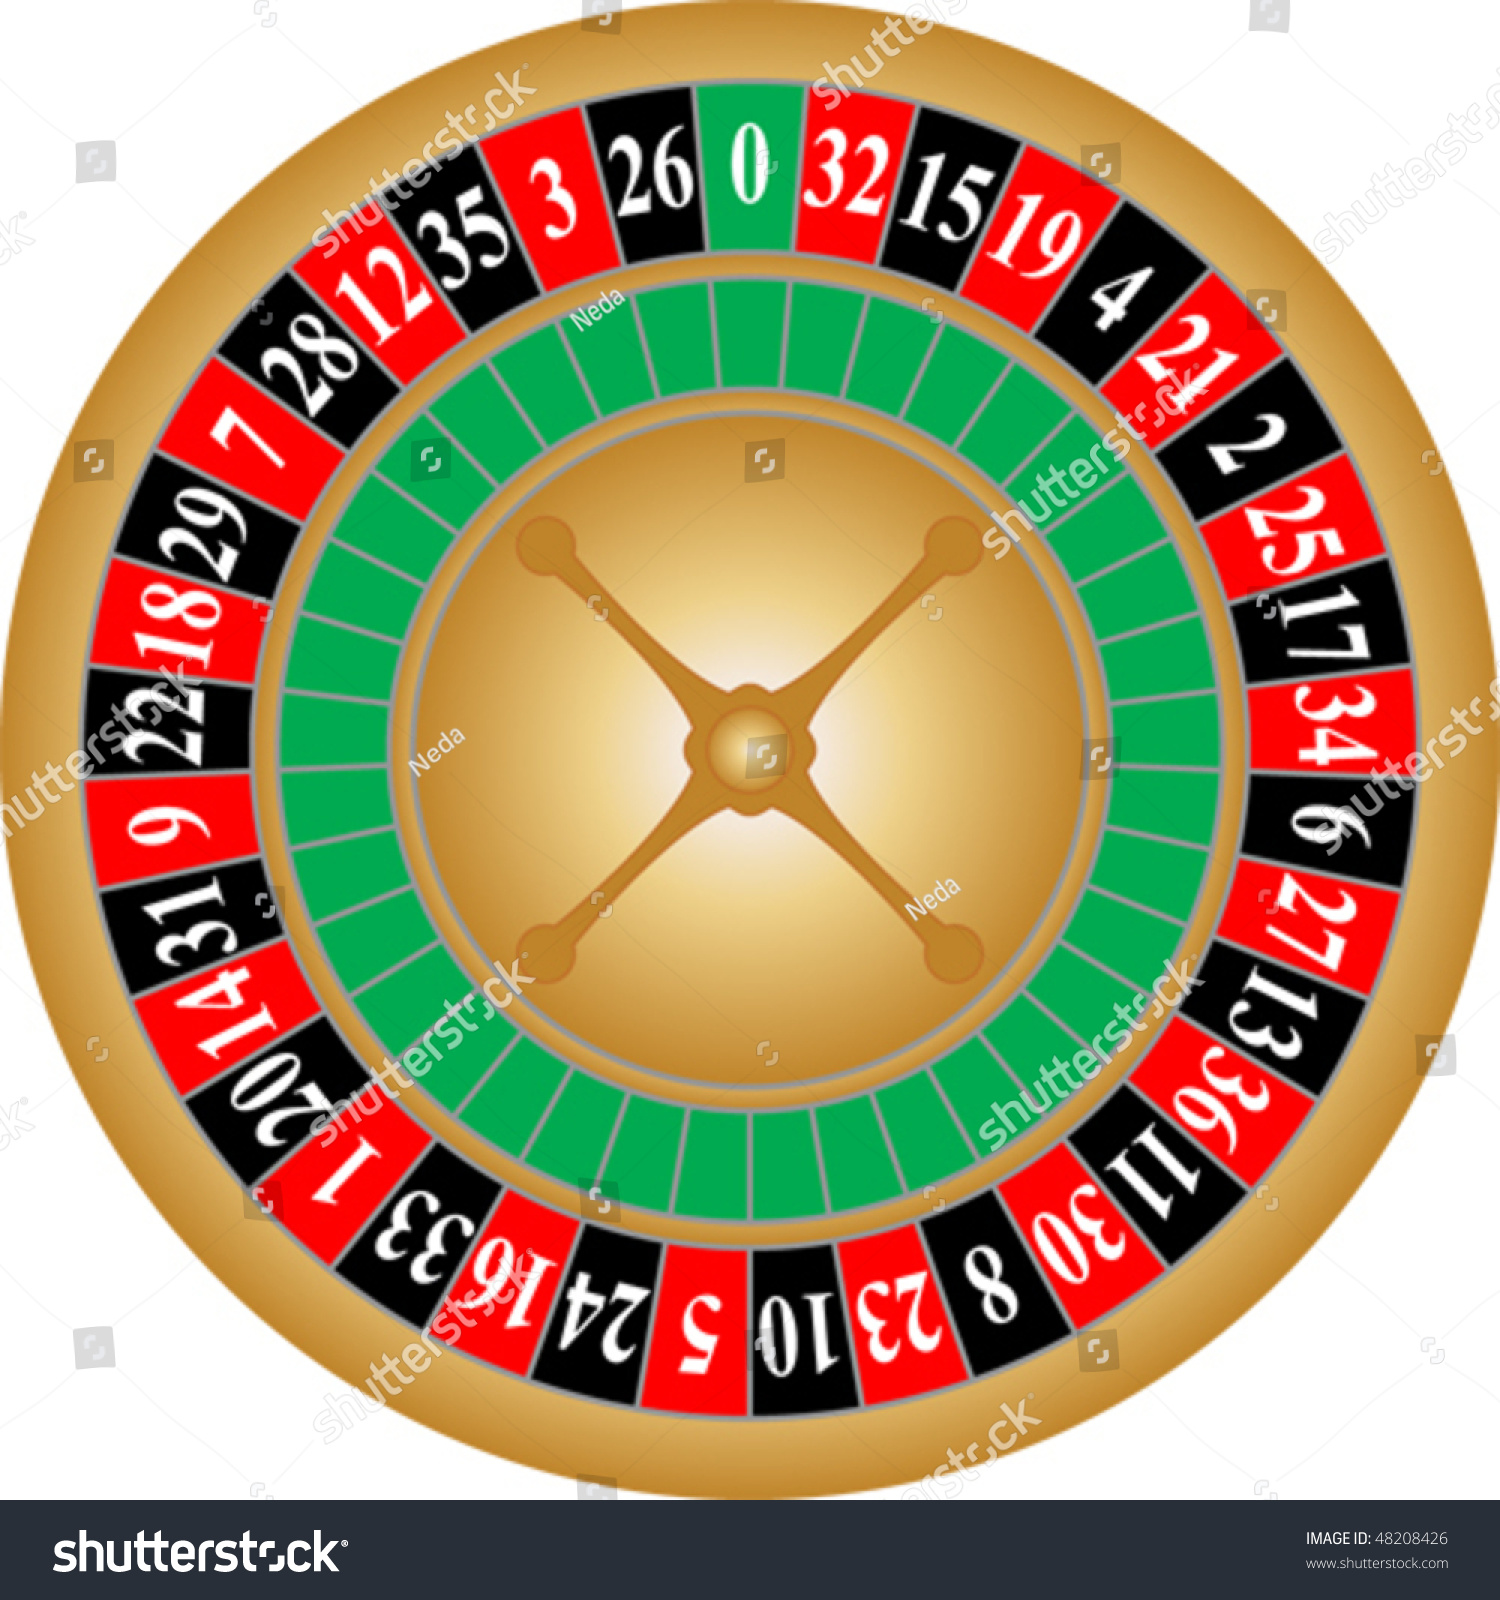 Roulette Wheel Image